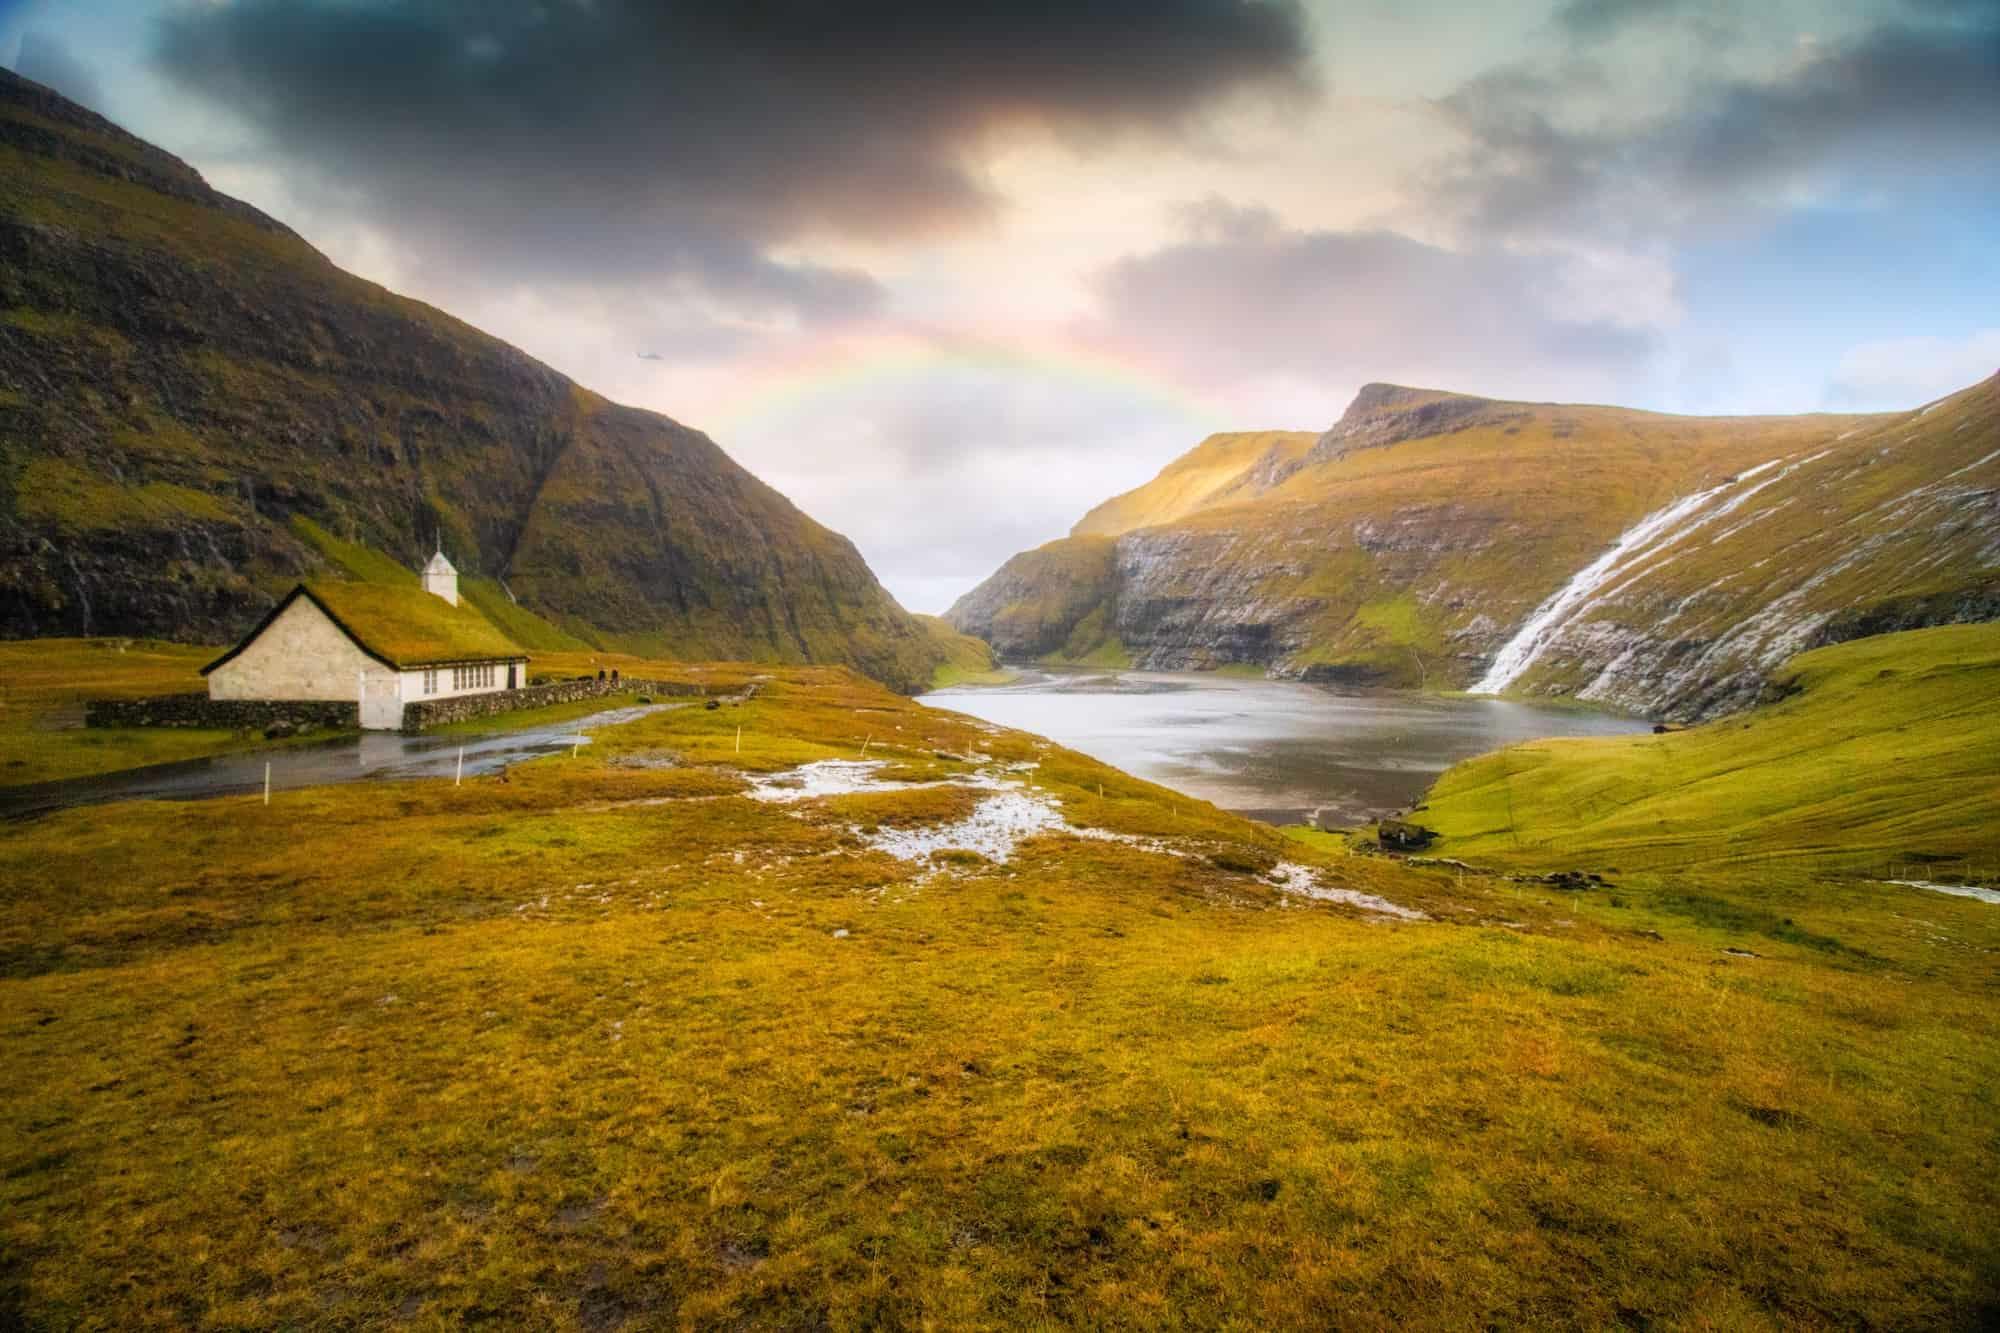 Faroe Islands Travel: 12 Reasons You Need to Go!